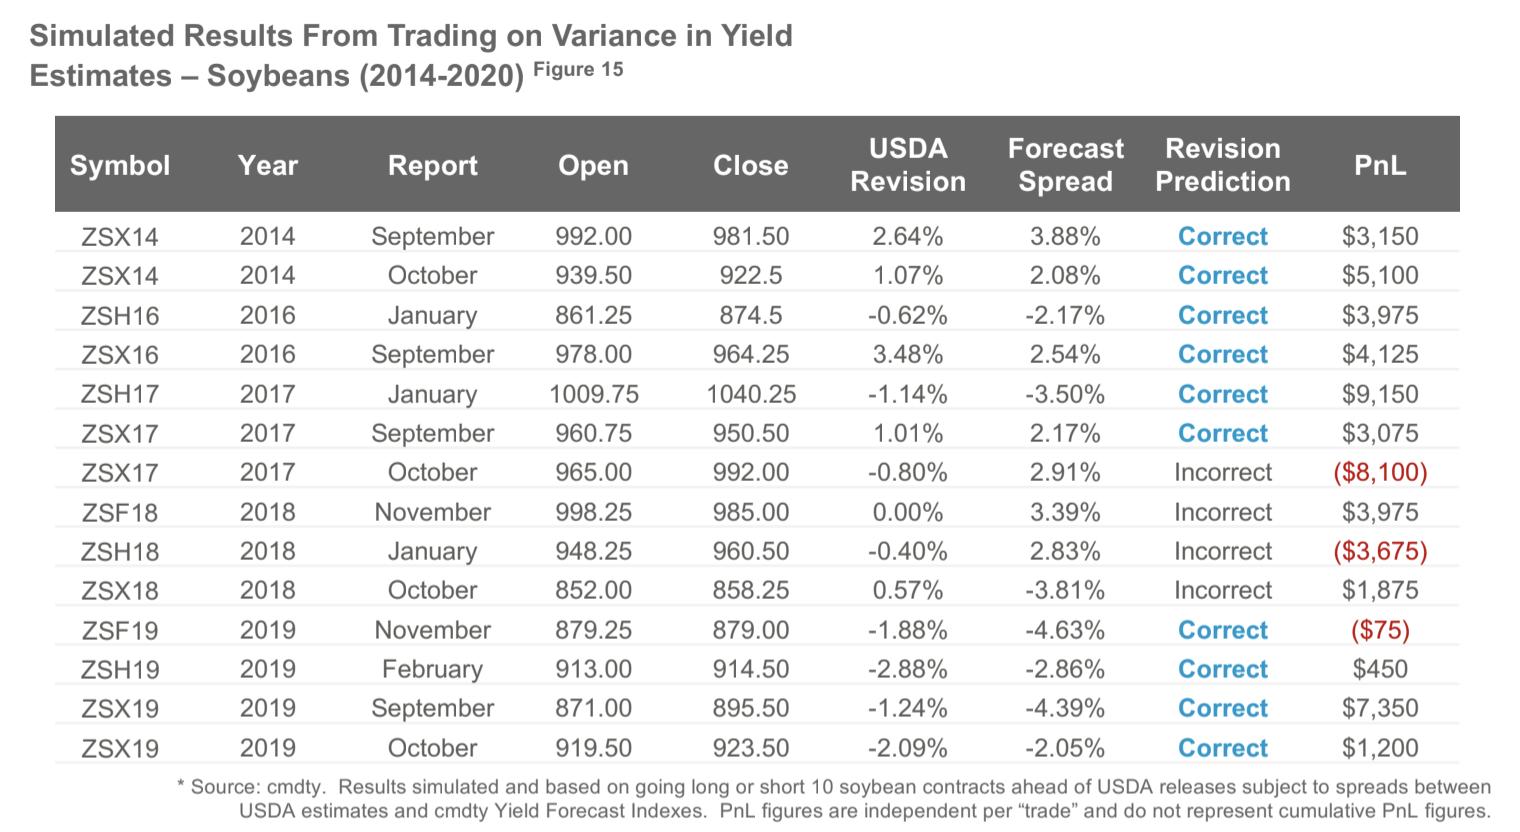 Soybean Yield Estimates